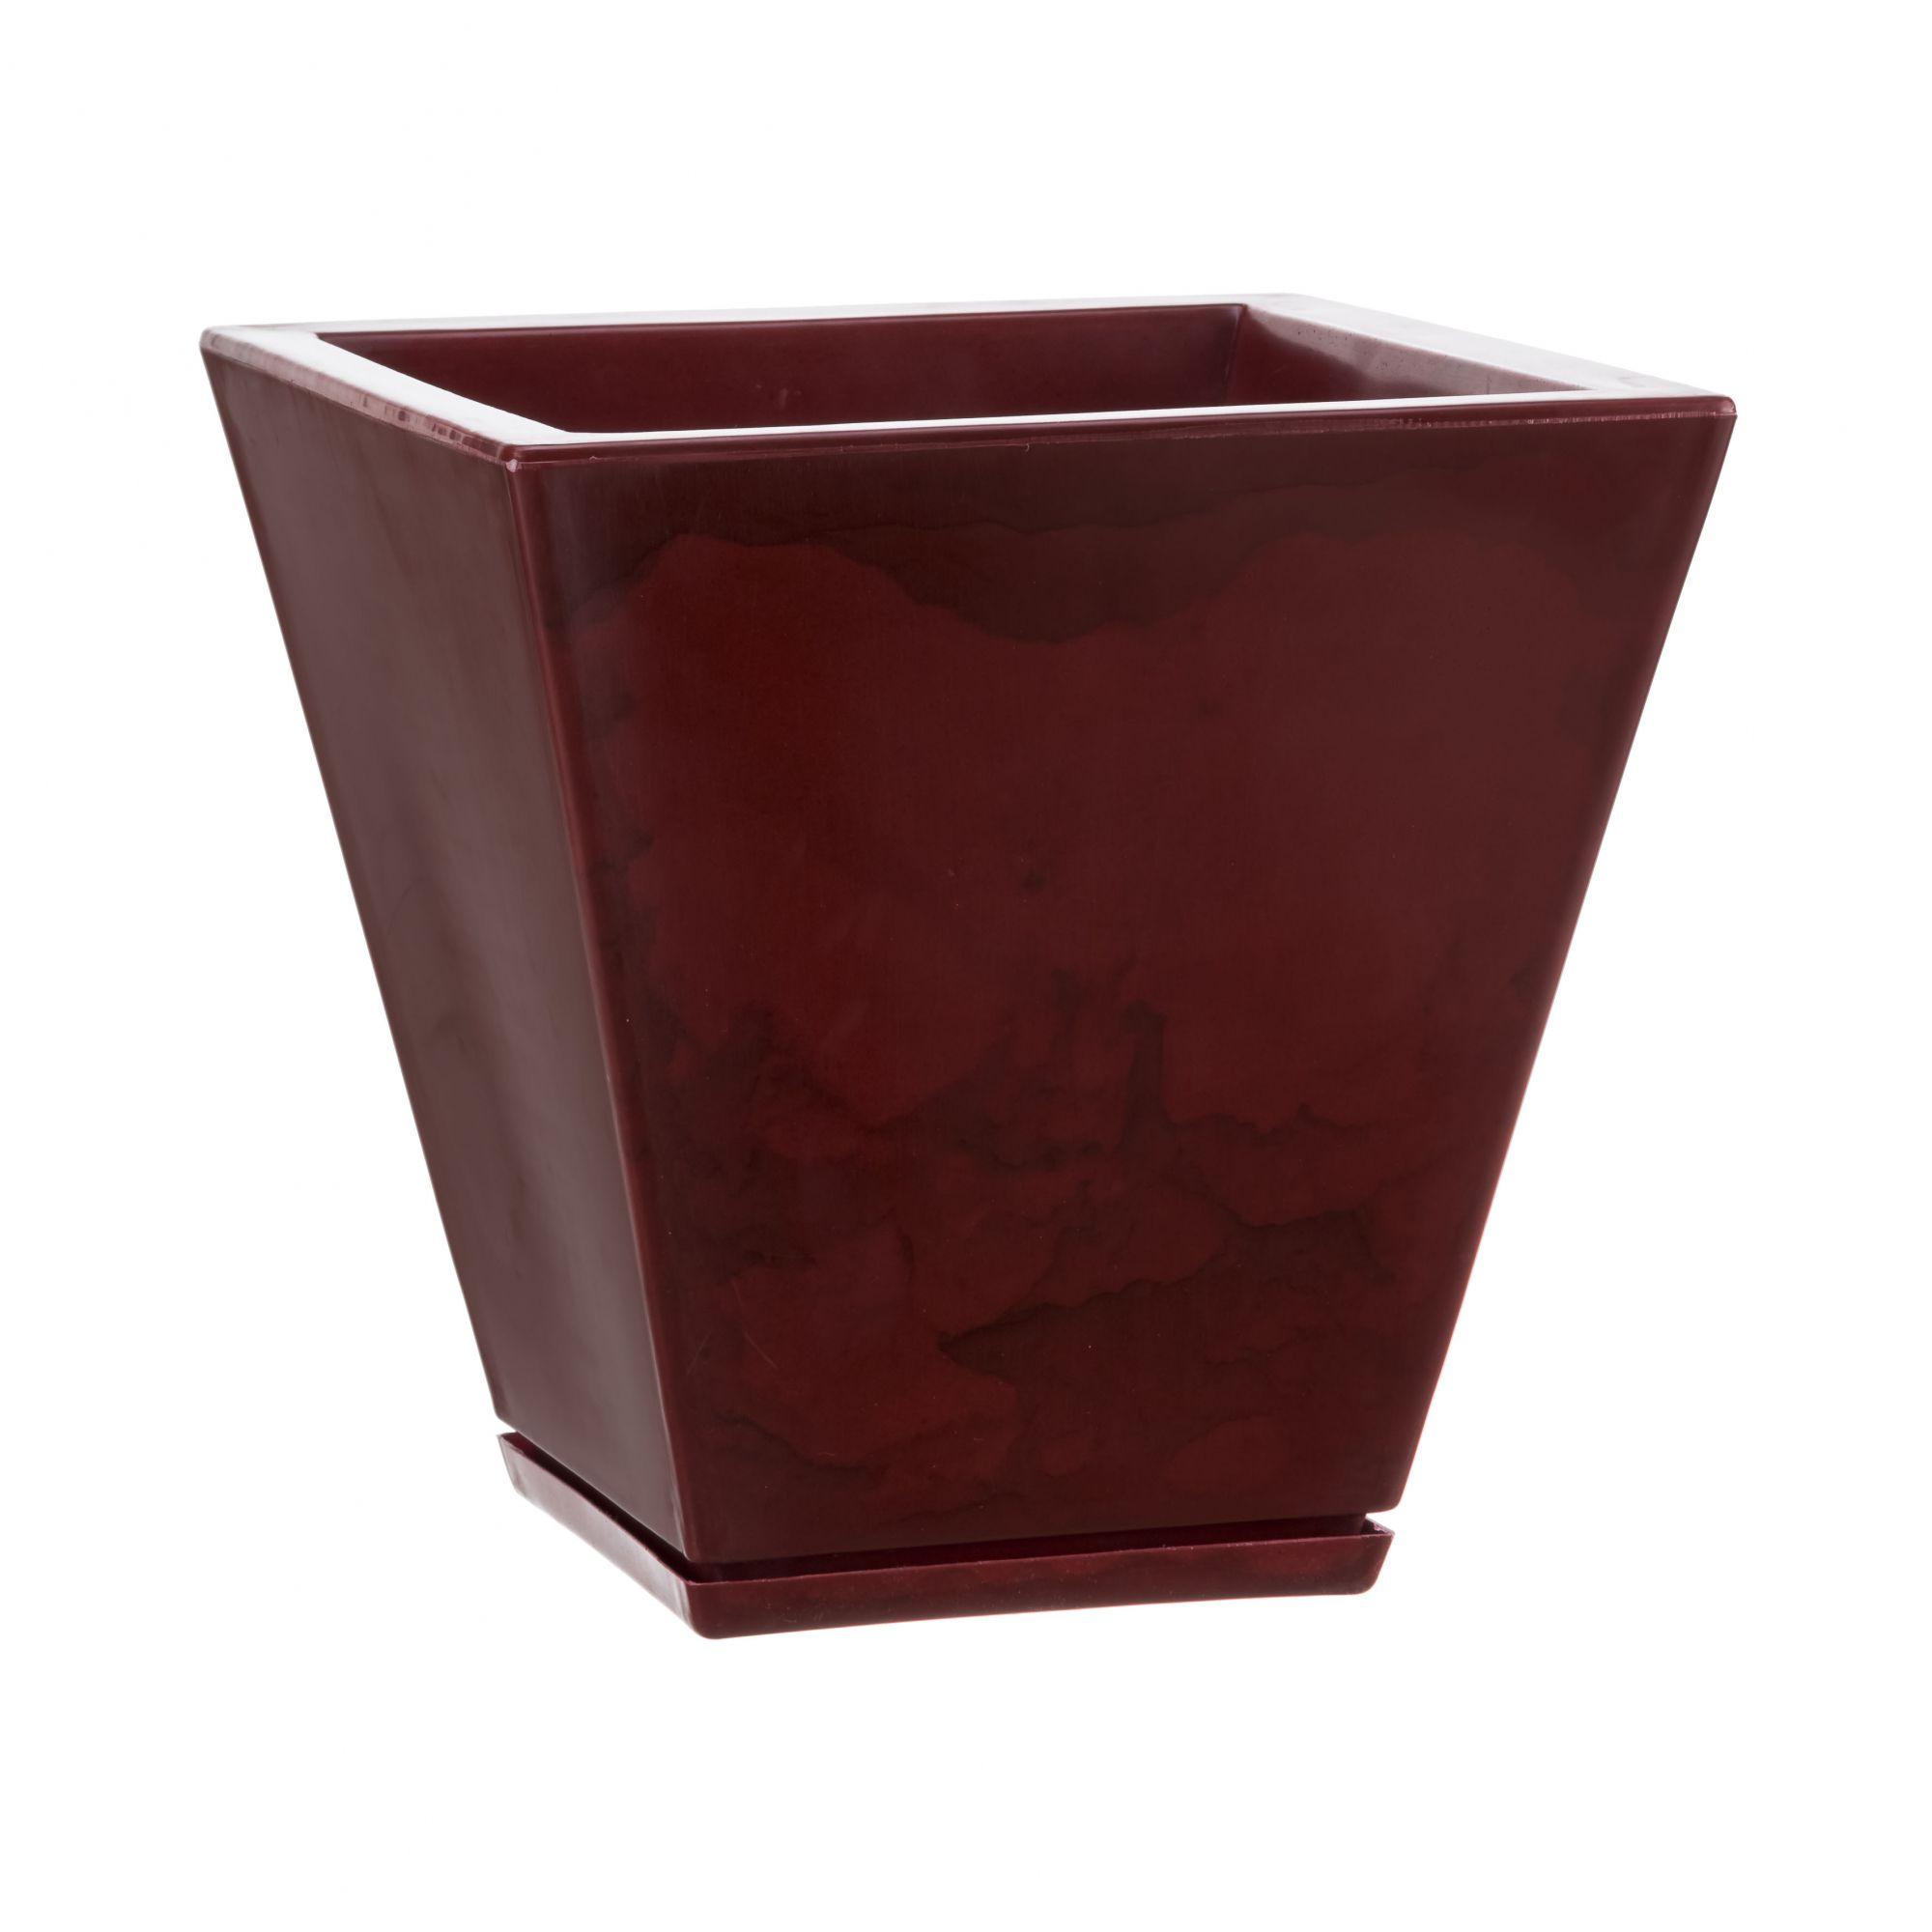 Vaso Zurique Marmorato Vermelho- 29 x 34cm